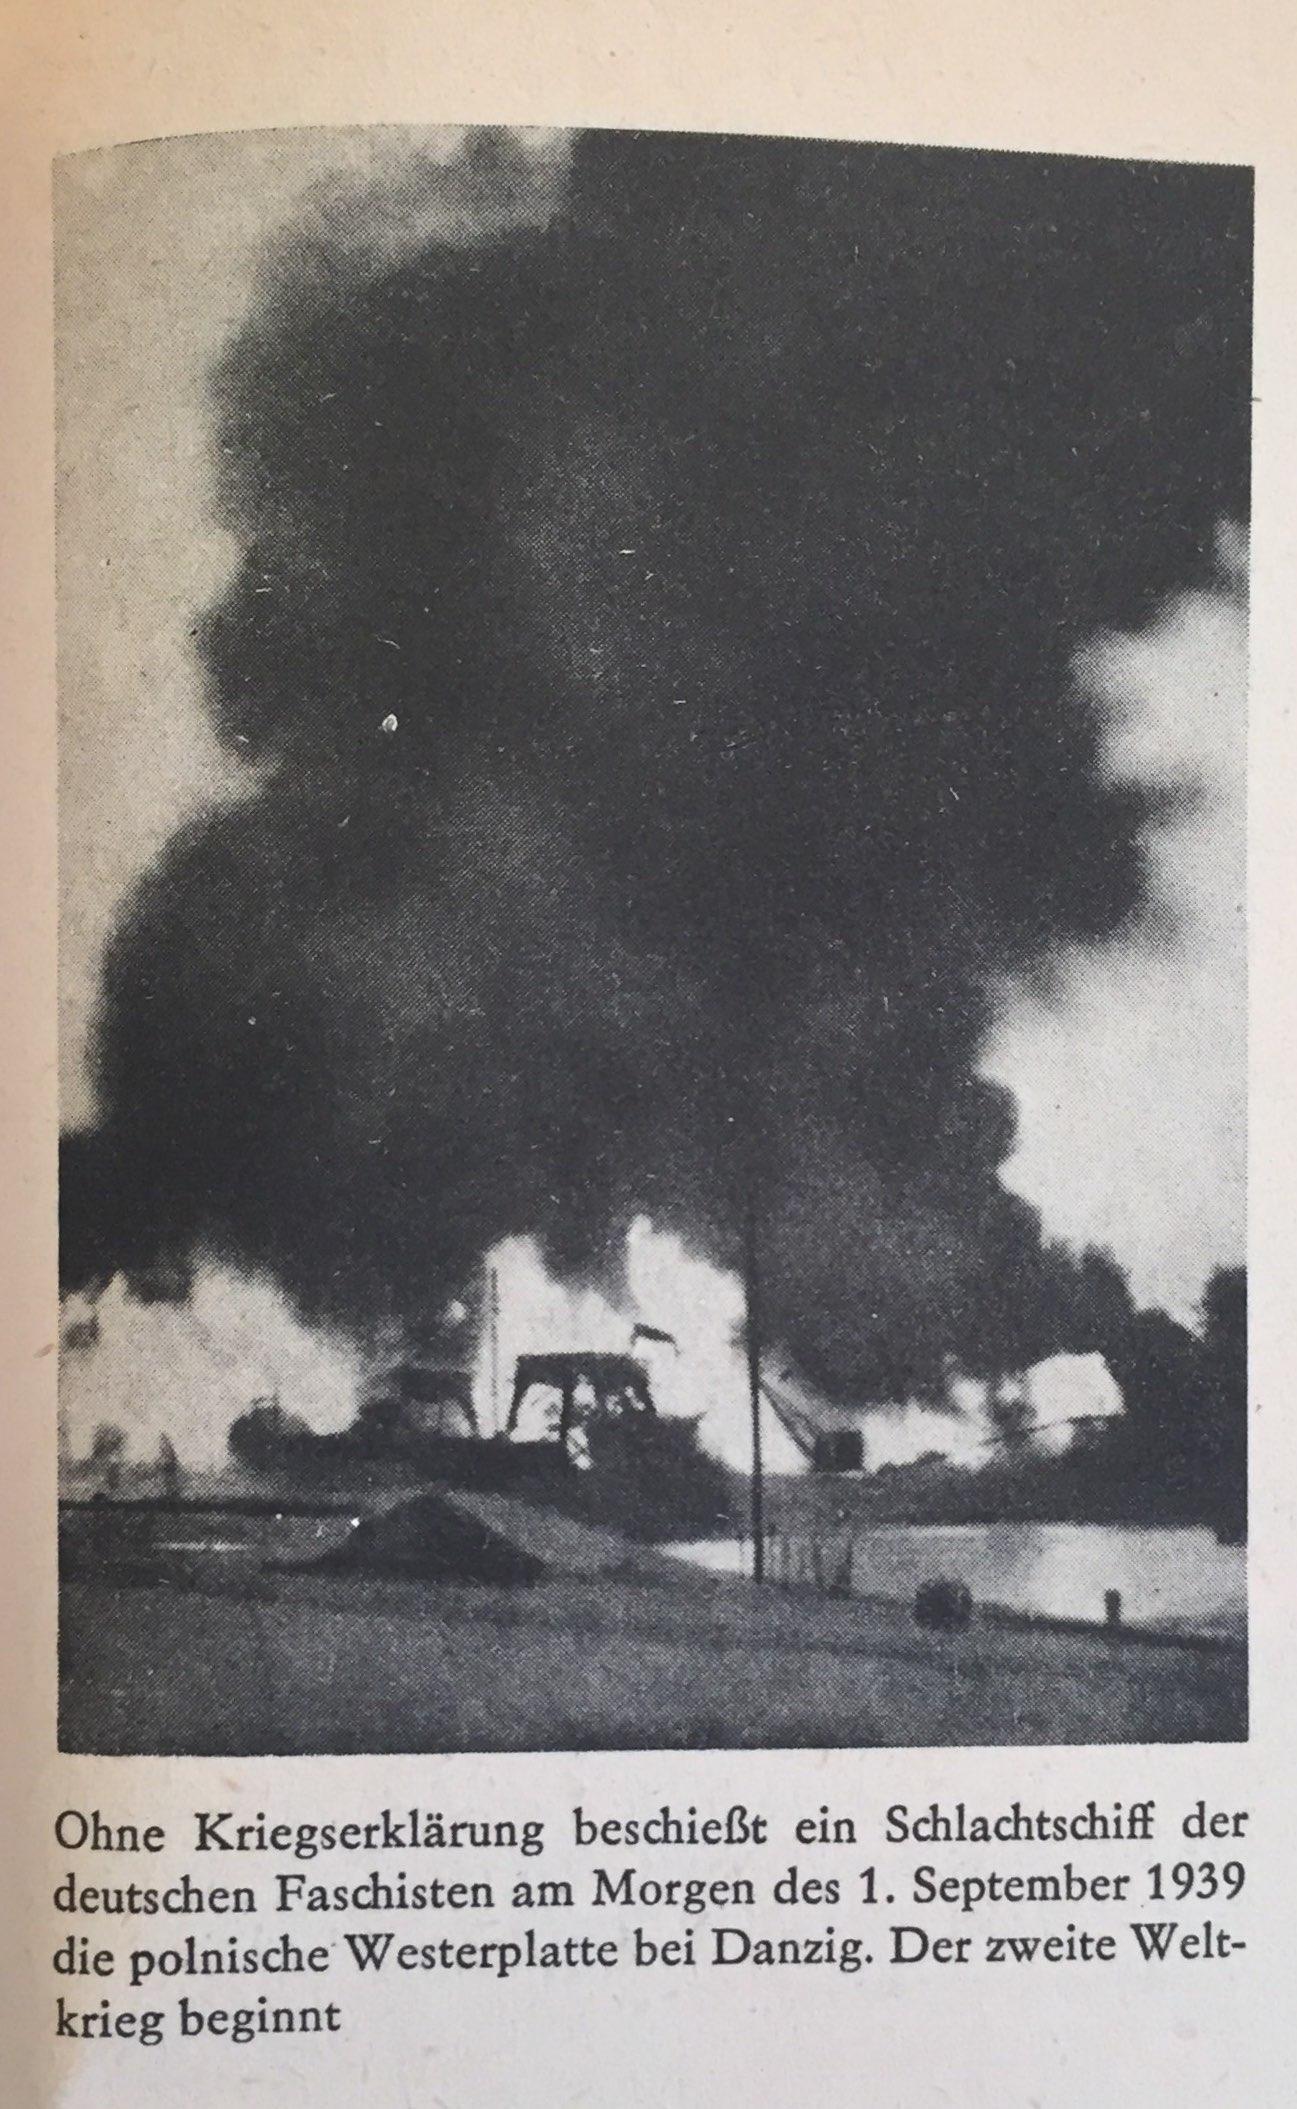 Die Entfesselung des II. Weltkrieges